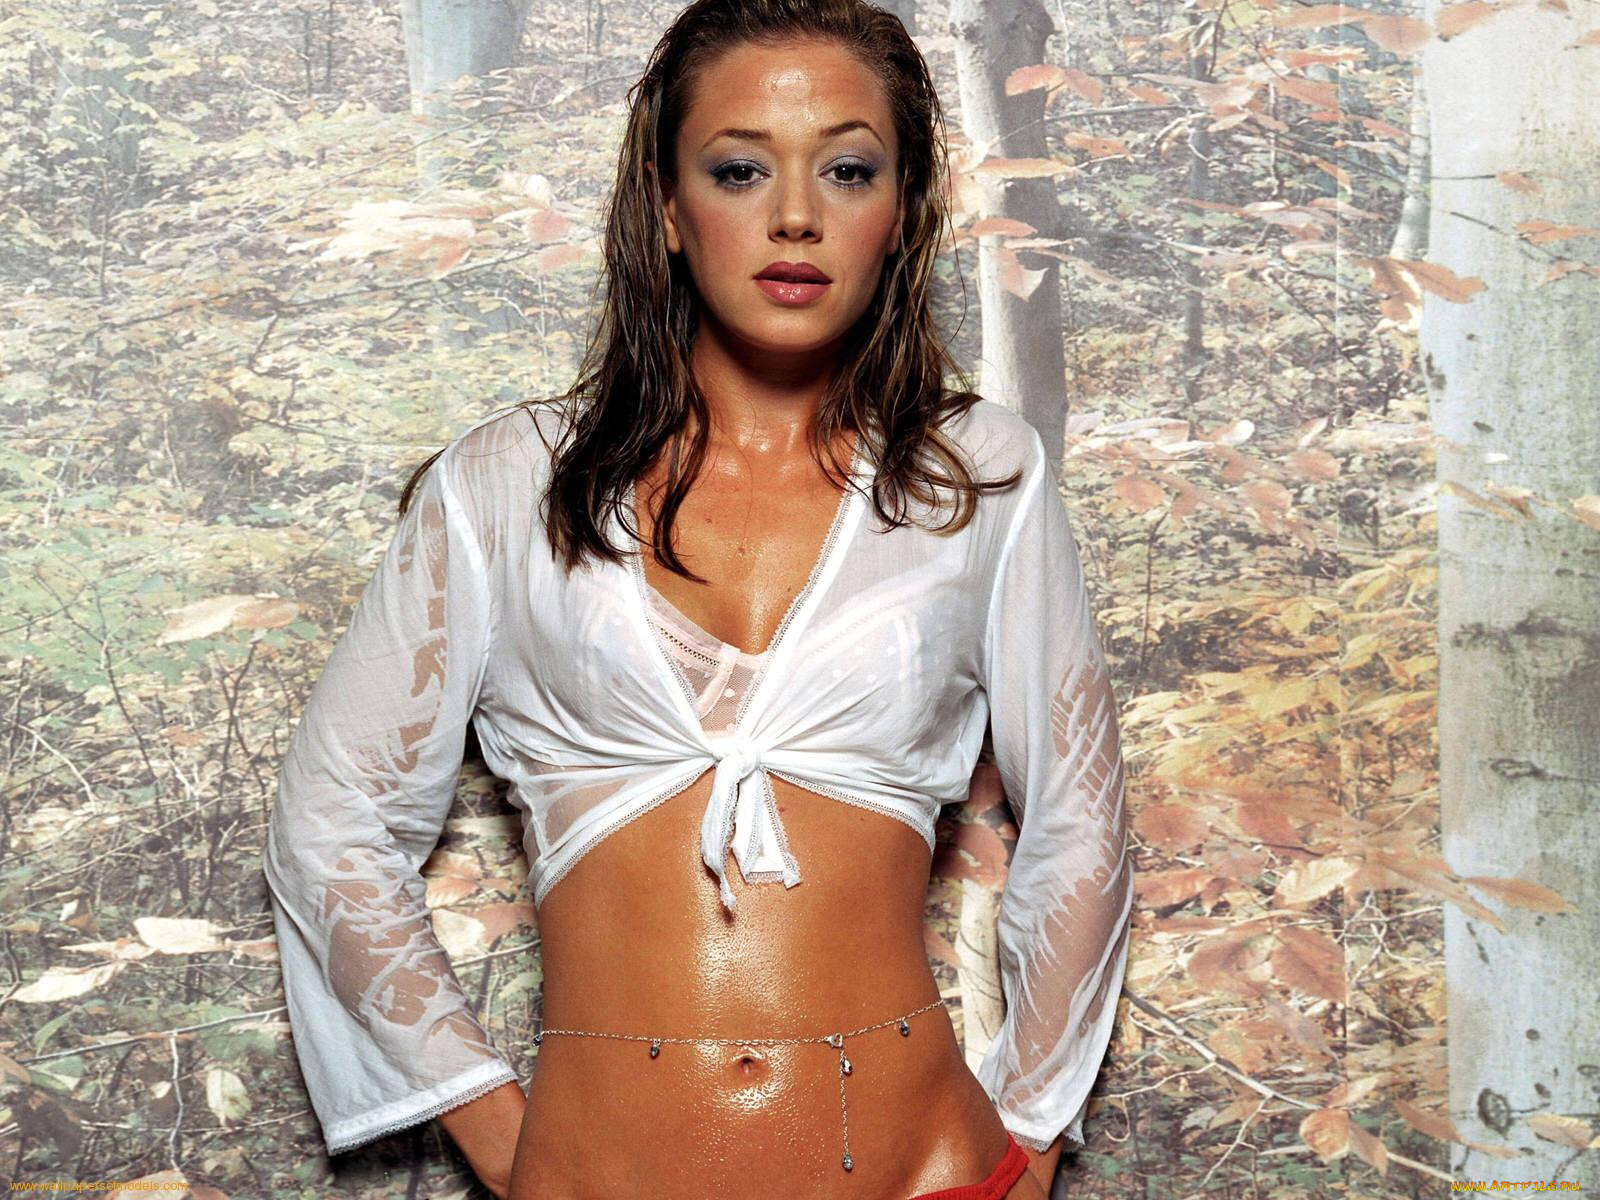 фото девушки в мокрой блузке - 12